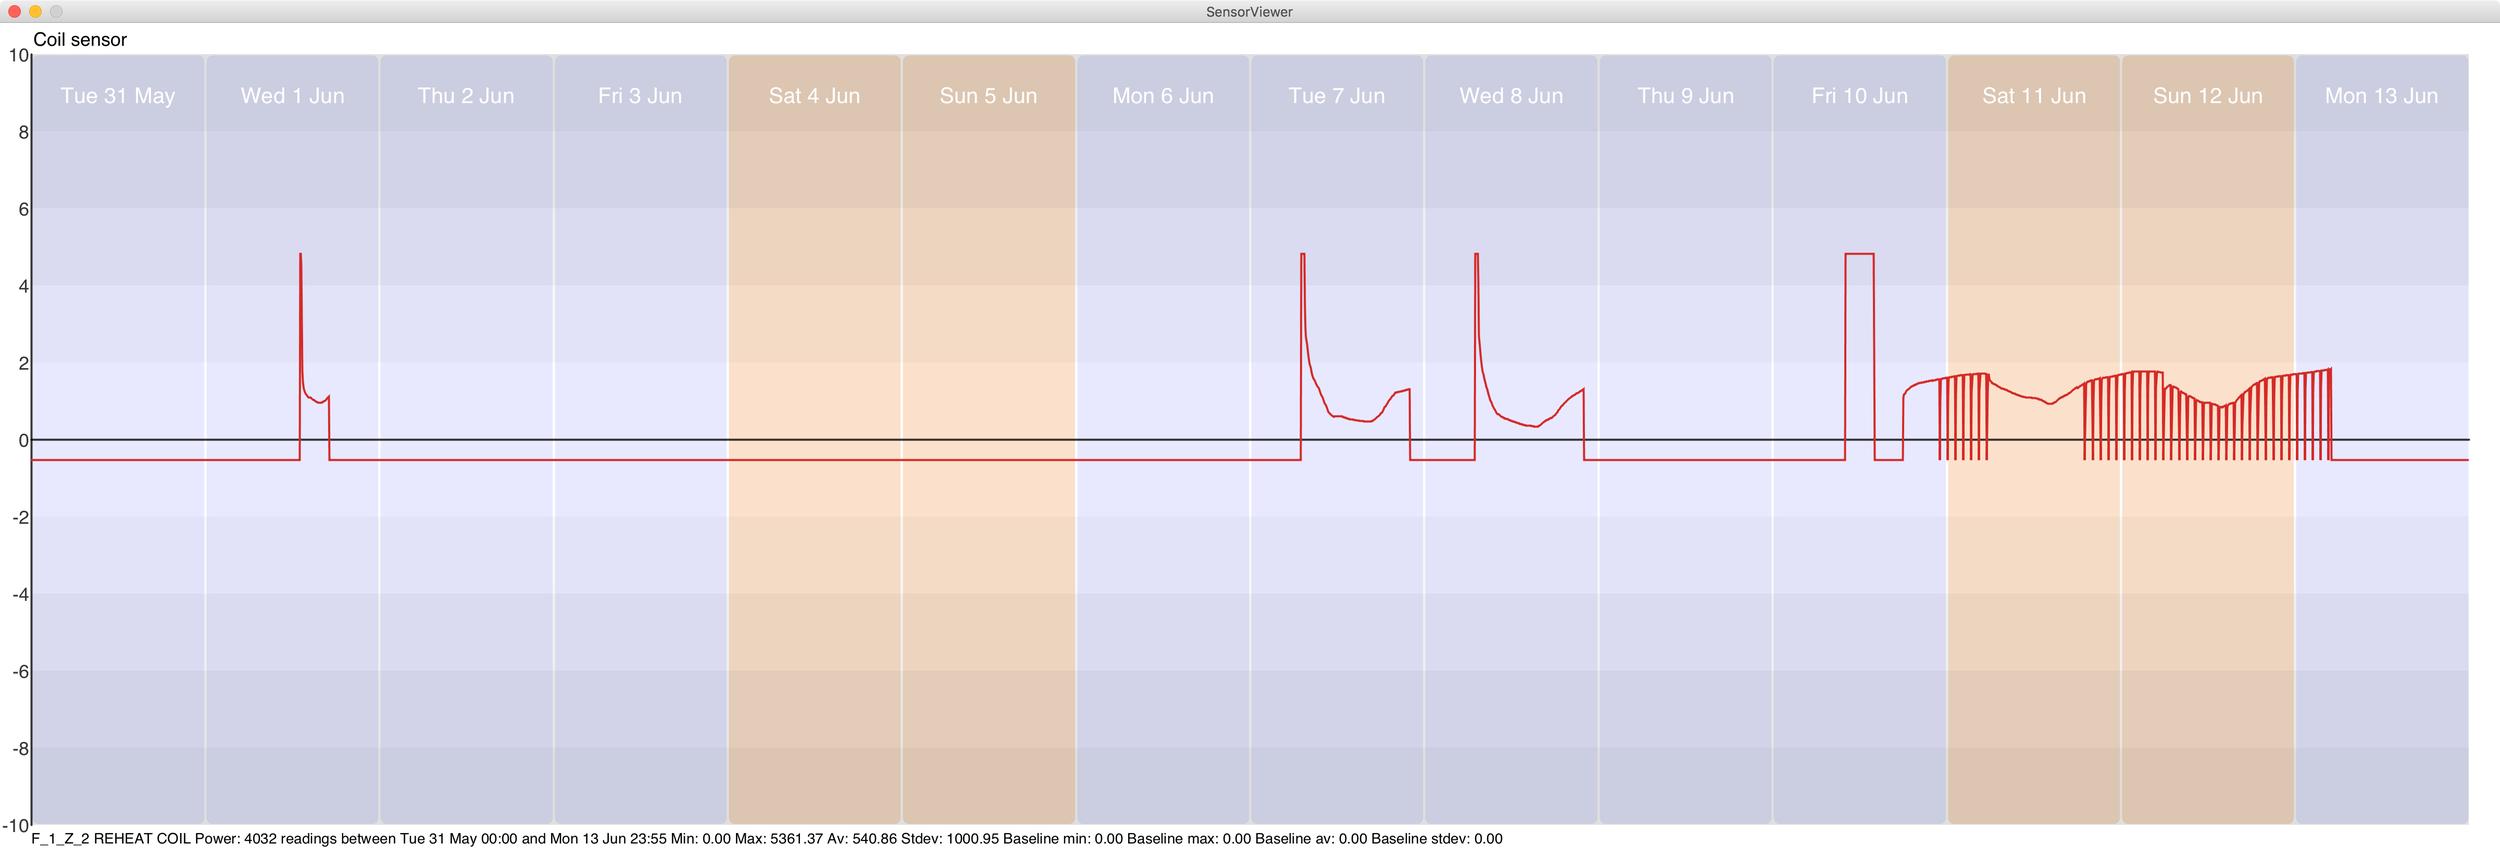 Figure 13  Reheat coil power sensor readings for floor 1 zone 2.  (click image for full size)